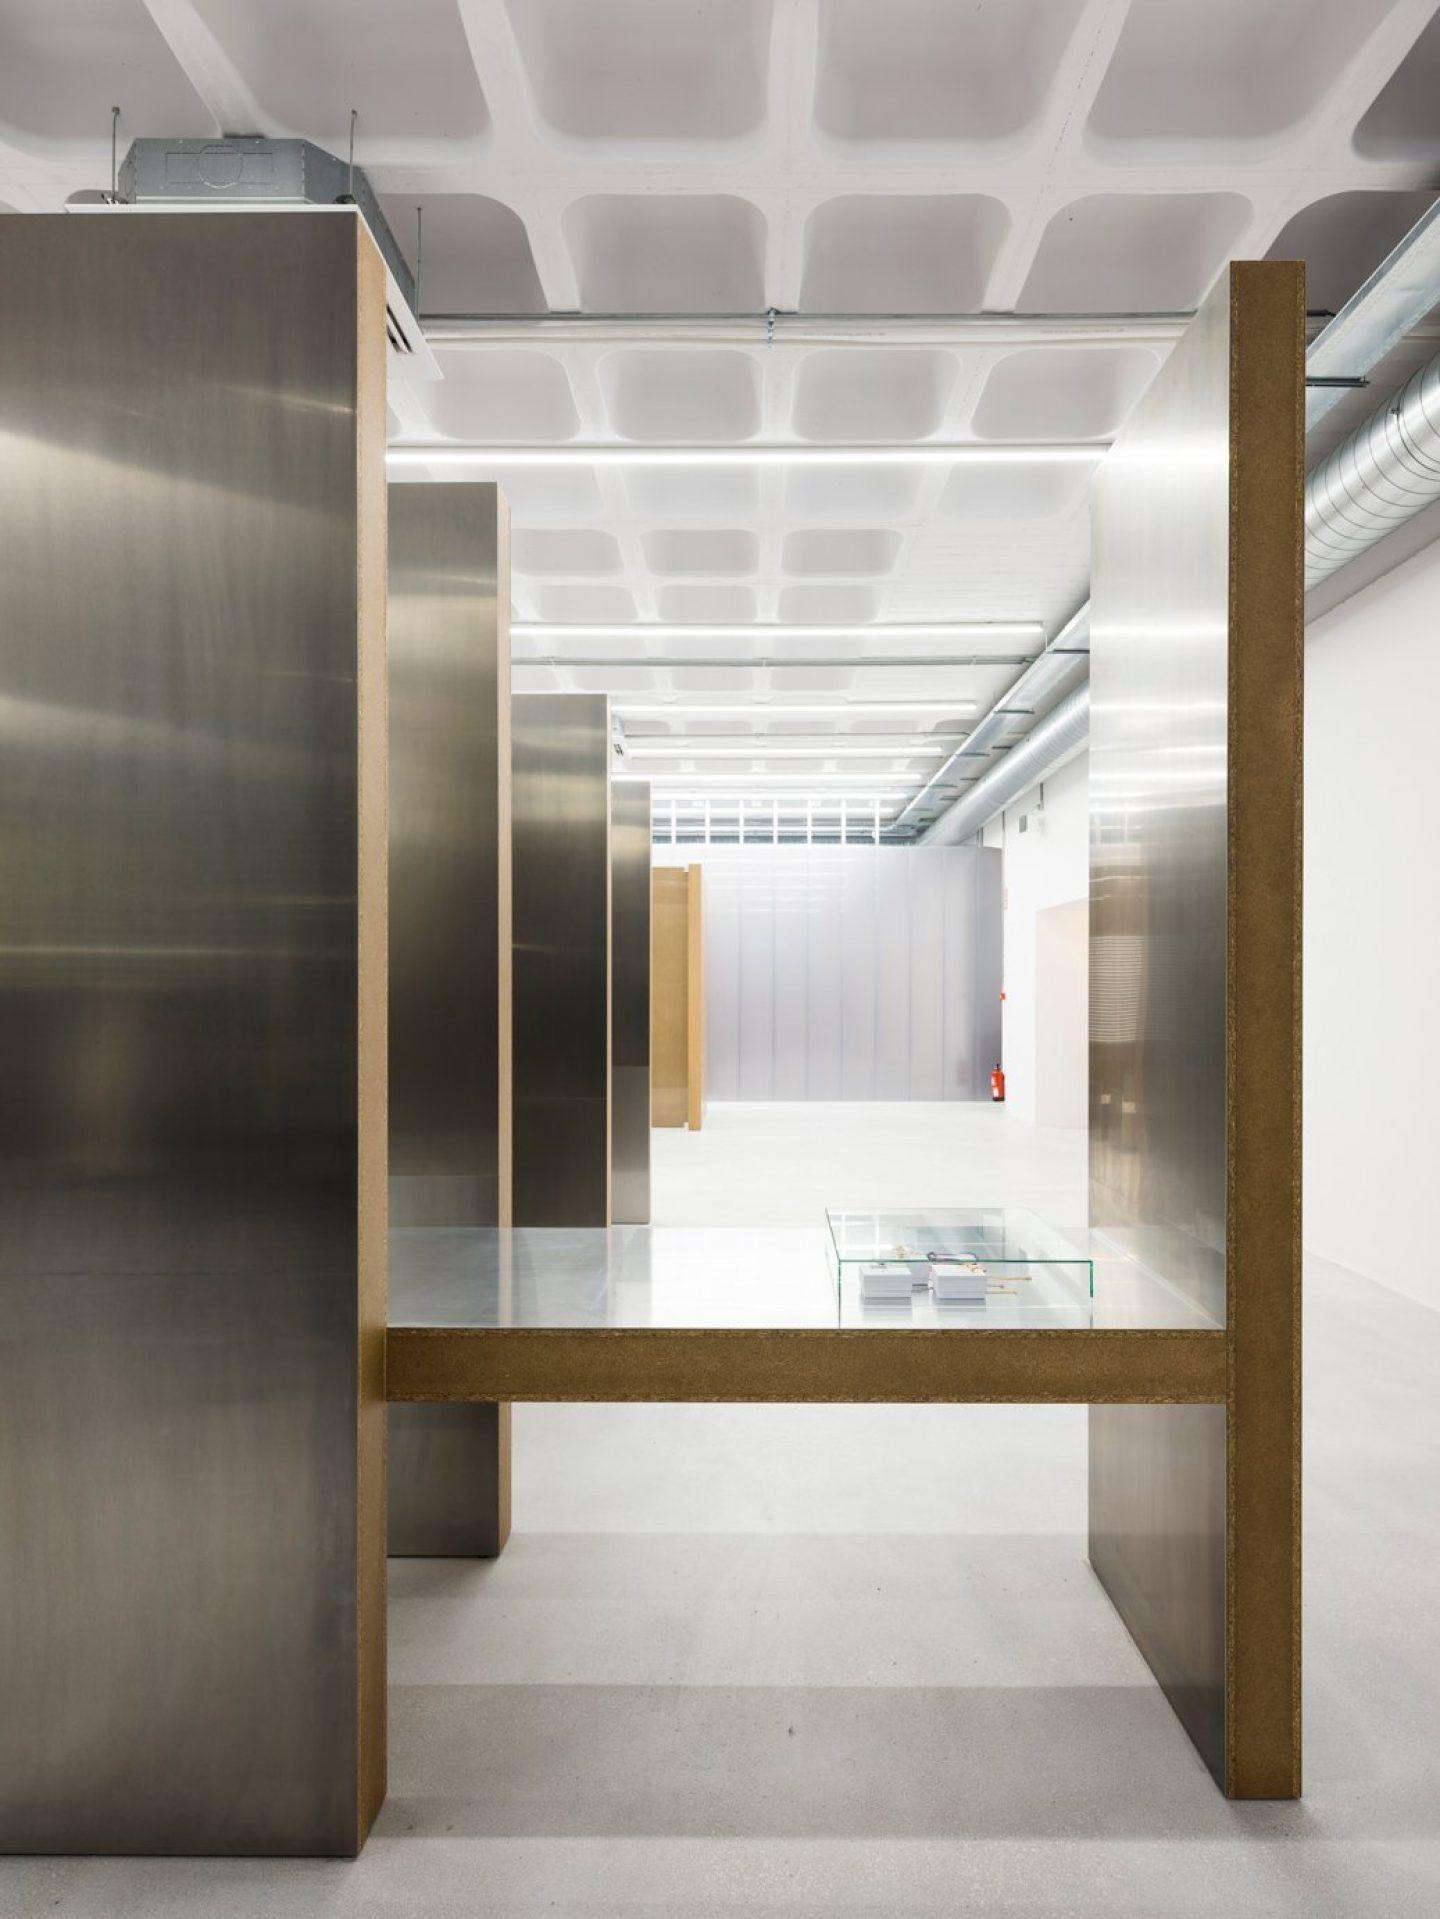 IGNANT-Architecture-Gonzalez-Haas-Tem-Plate-008